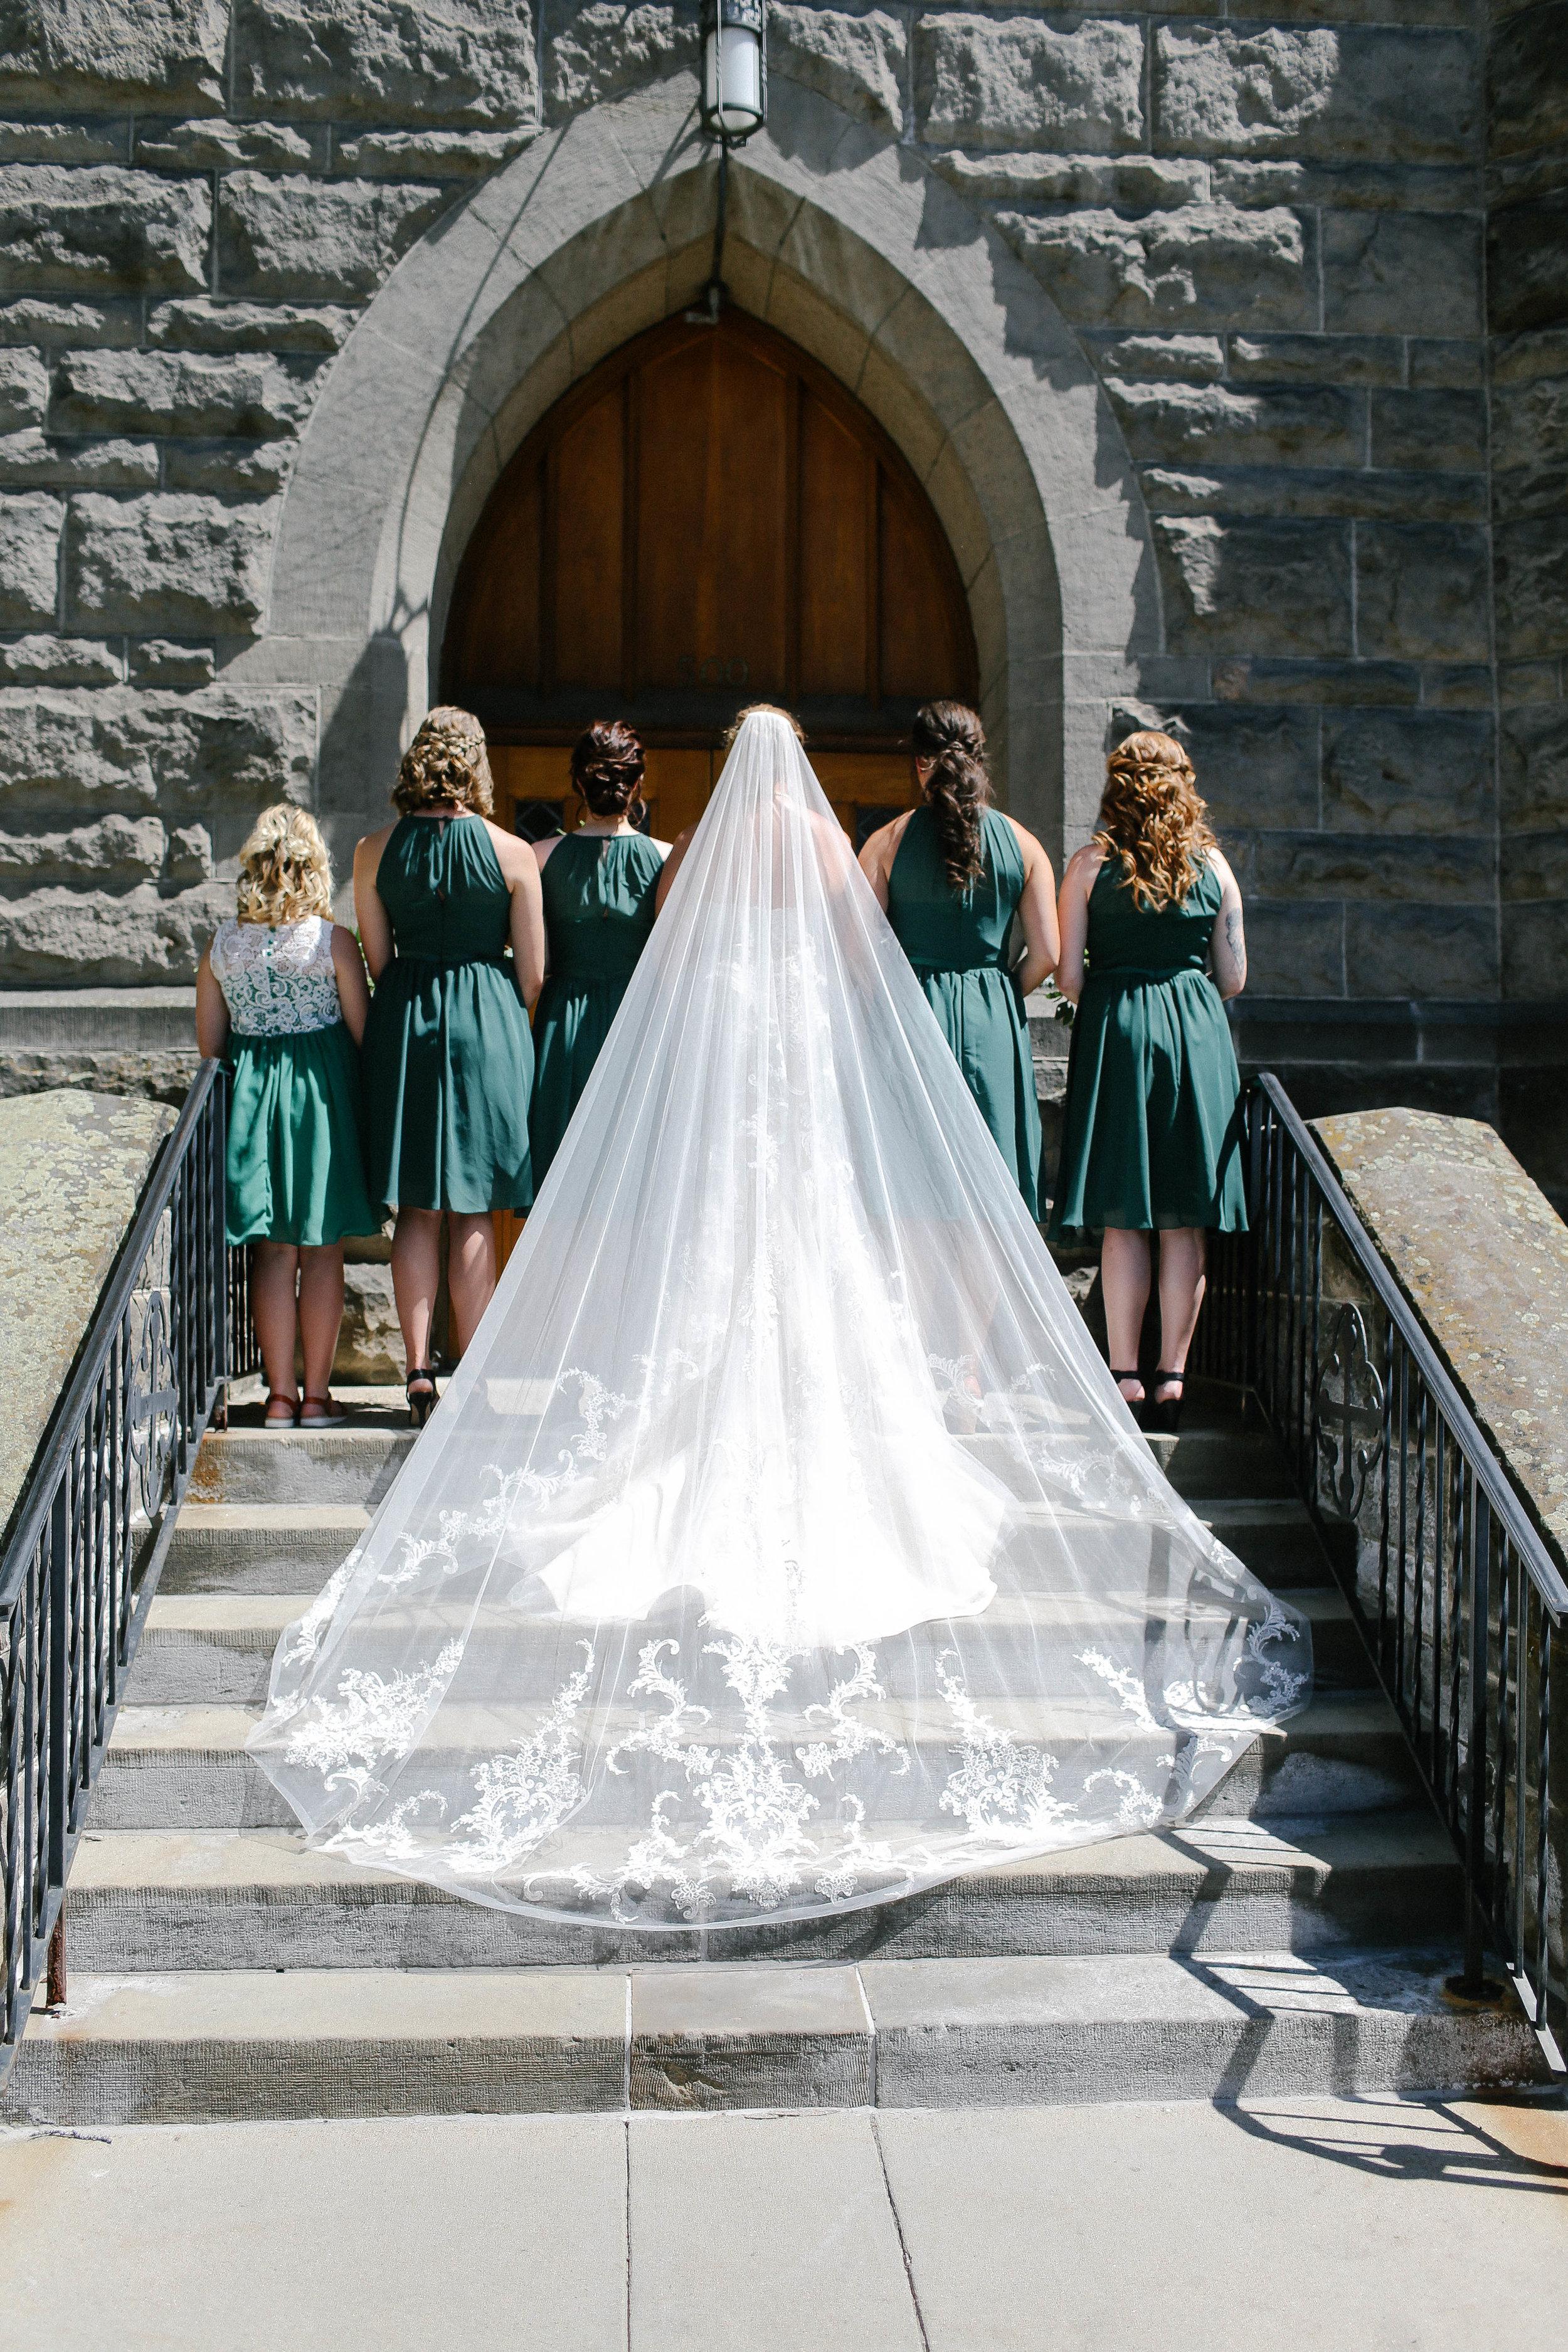 A-Lydia-Rohan-Downtown-Boise-Wedding-31.jpg